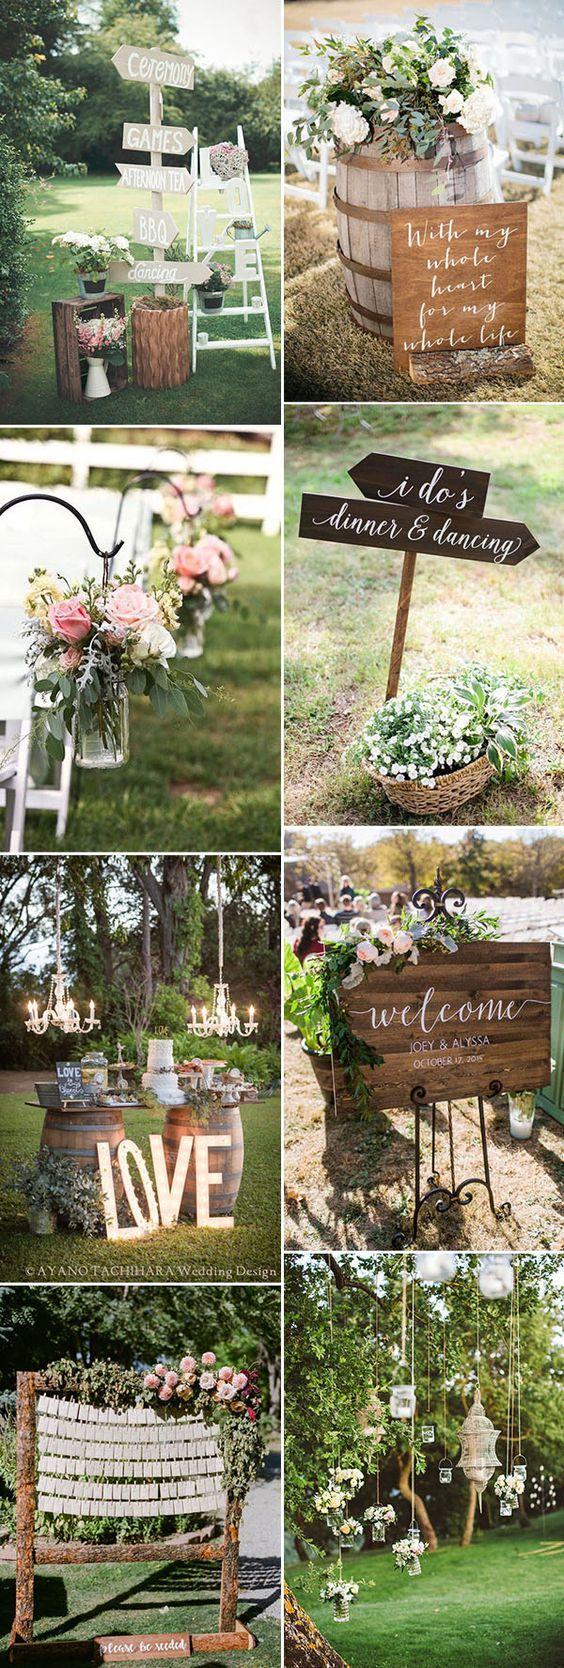 48 Most Inspiring Garden Inspired Wedding Ideas Amazing Gardens